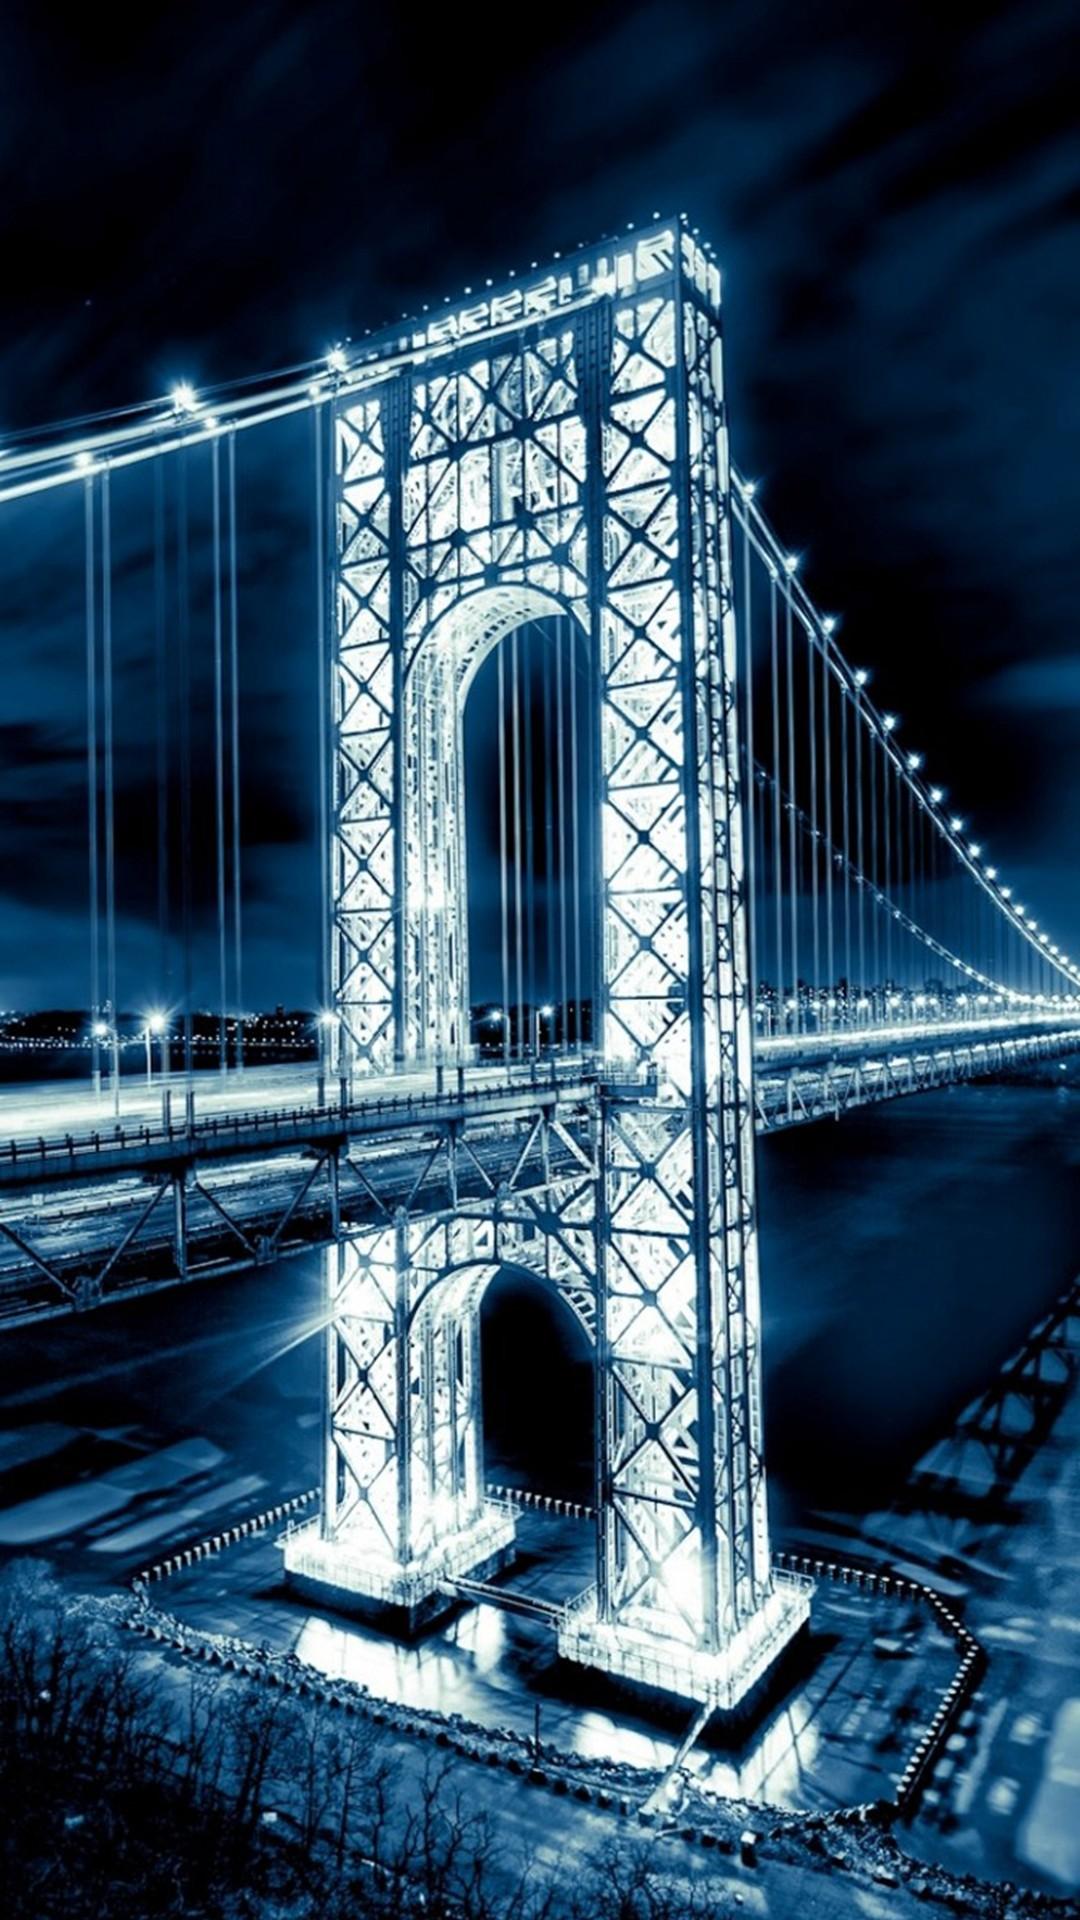 Night Shiny Long Bridge Nature Landscape iPhone 6 wallpaper